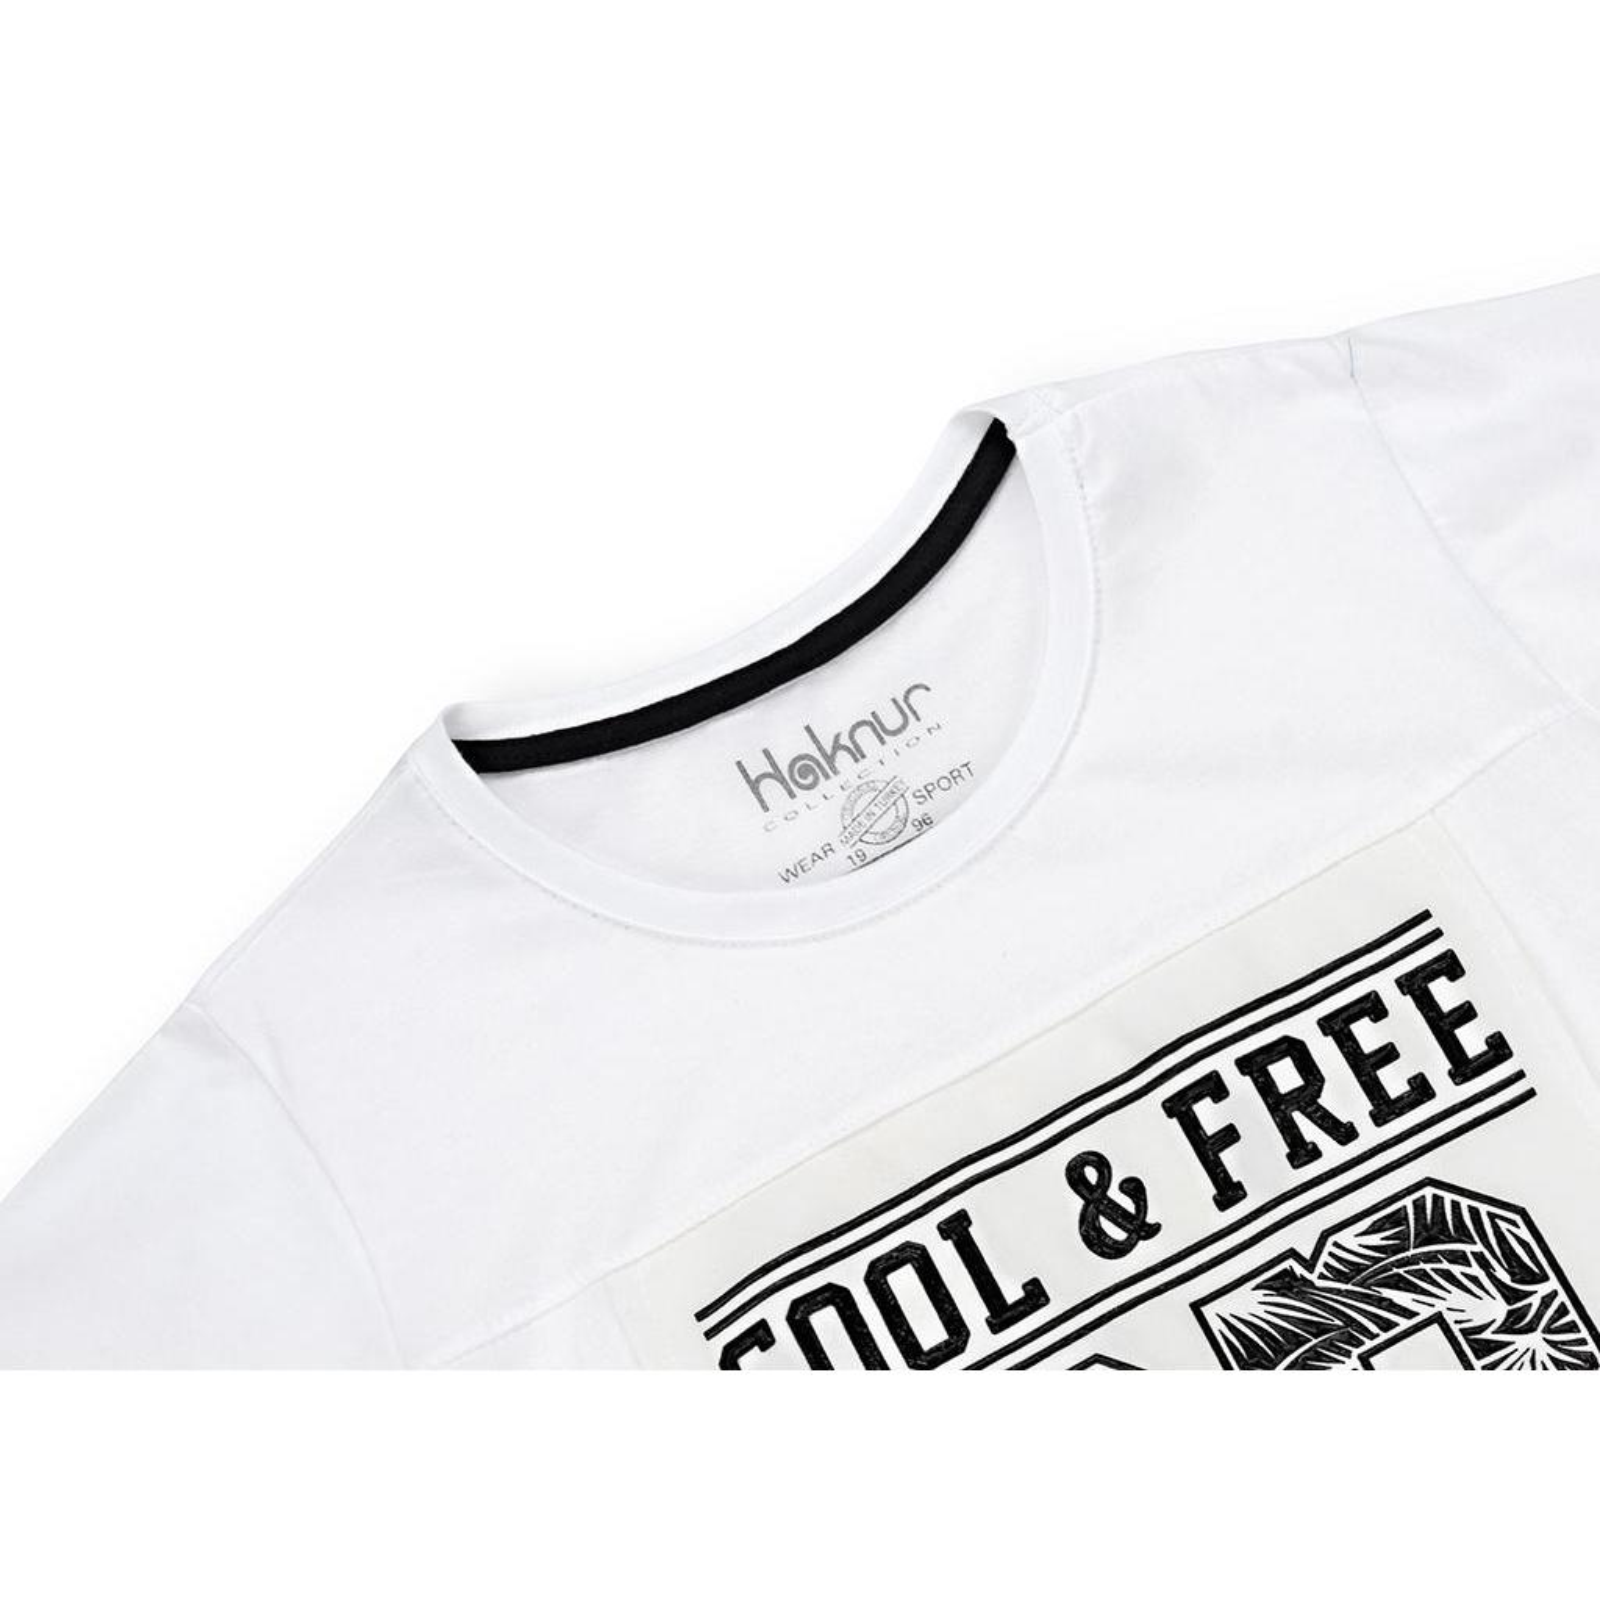 "Футболка детская Haknur ""COOL & FREE"" (6547-146B-white) изображение 3"